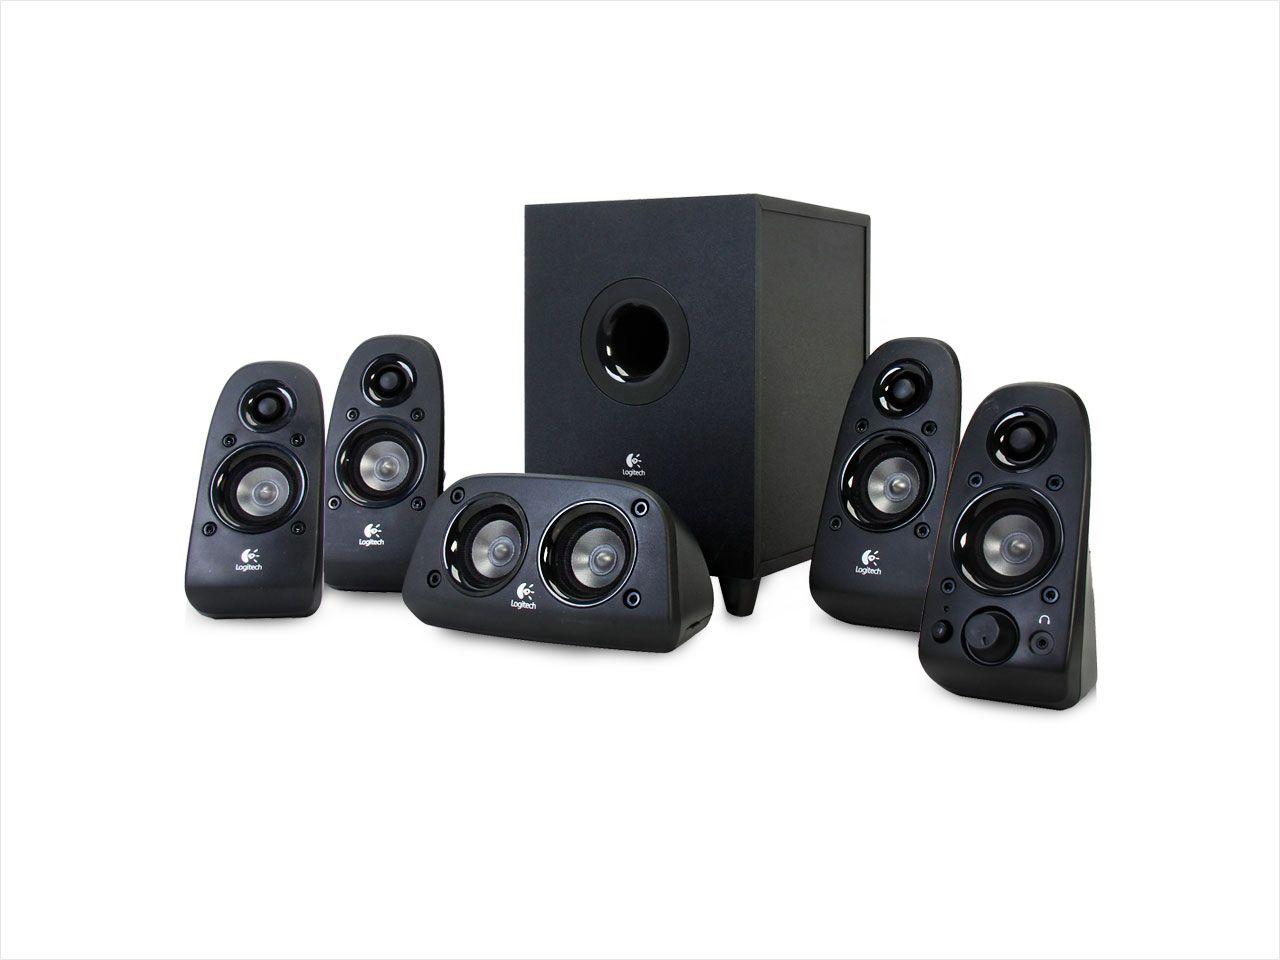 db9c8fb6ebc Logitech Z506 5.1-Ch Home Theater Speaker System (Refurb ...